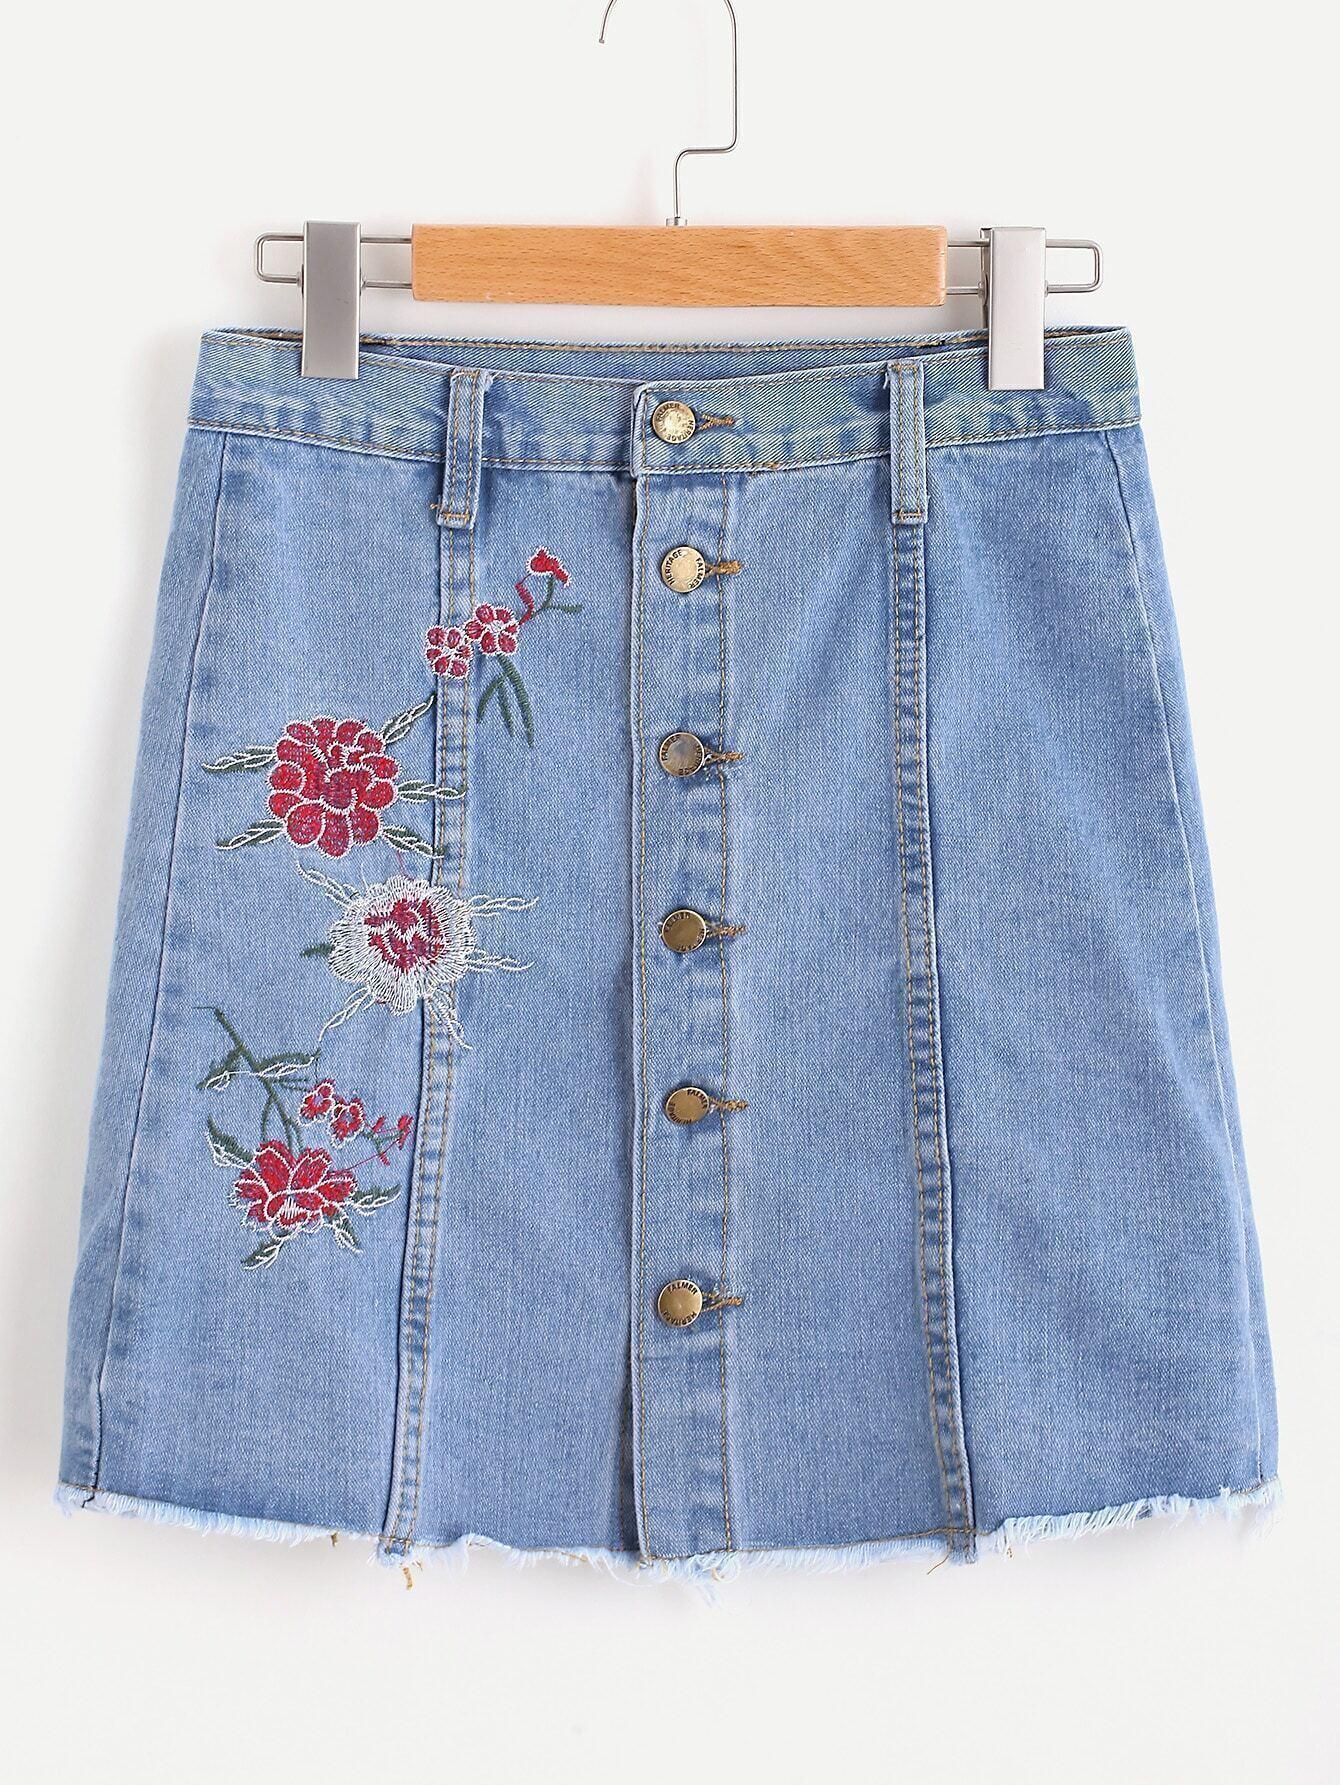 Floral Embroidered Single Breasted Fray Hem Skirt